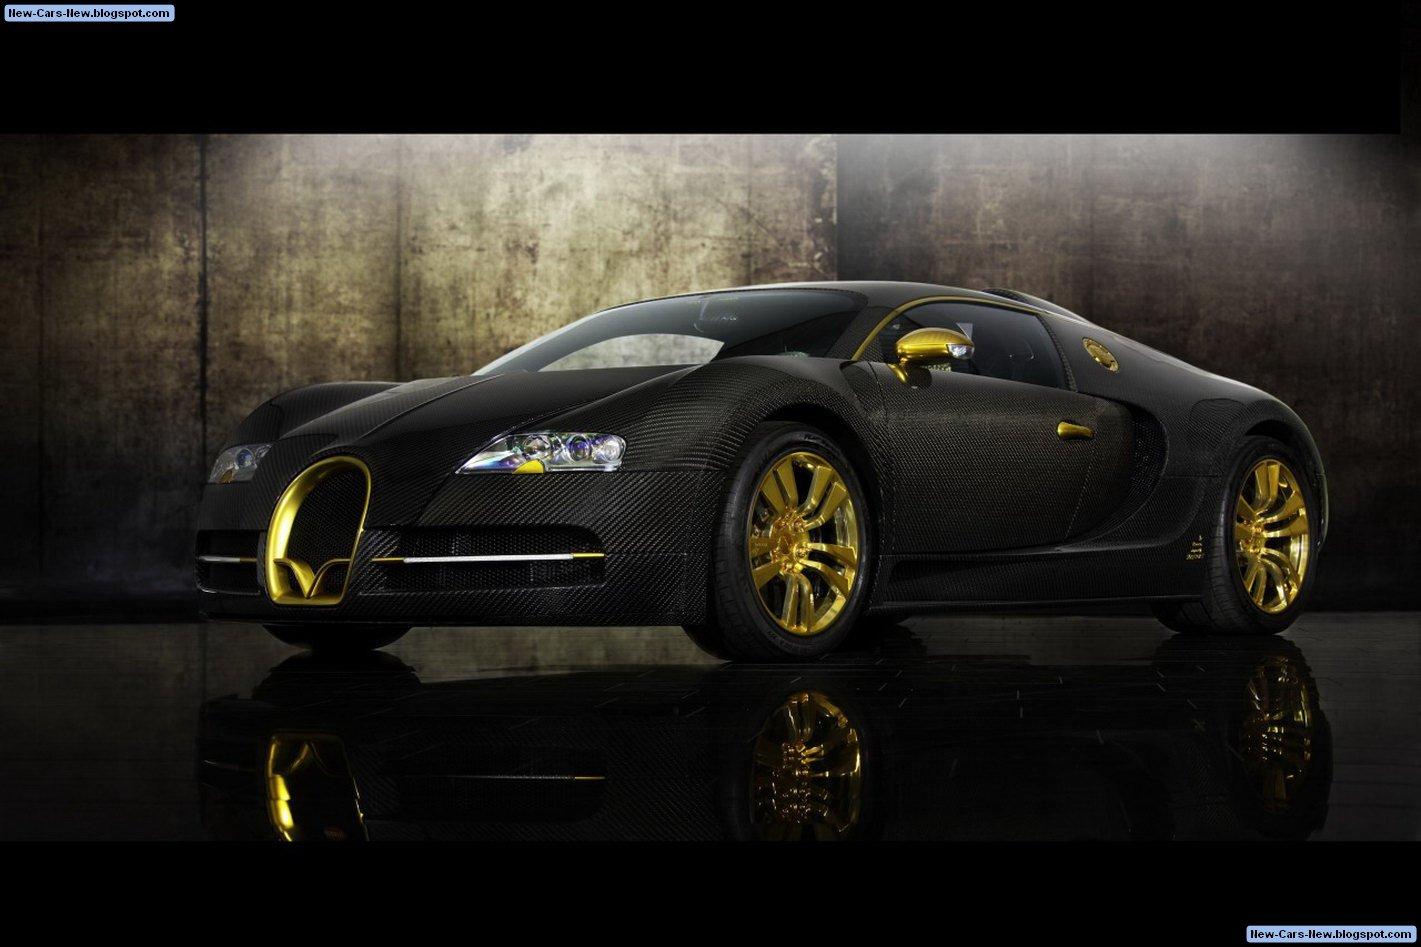 mansory bugatti veyron best car blog mansory bugatti veyron. Black Bedroom Furniture Sets. Home Design Ideas